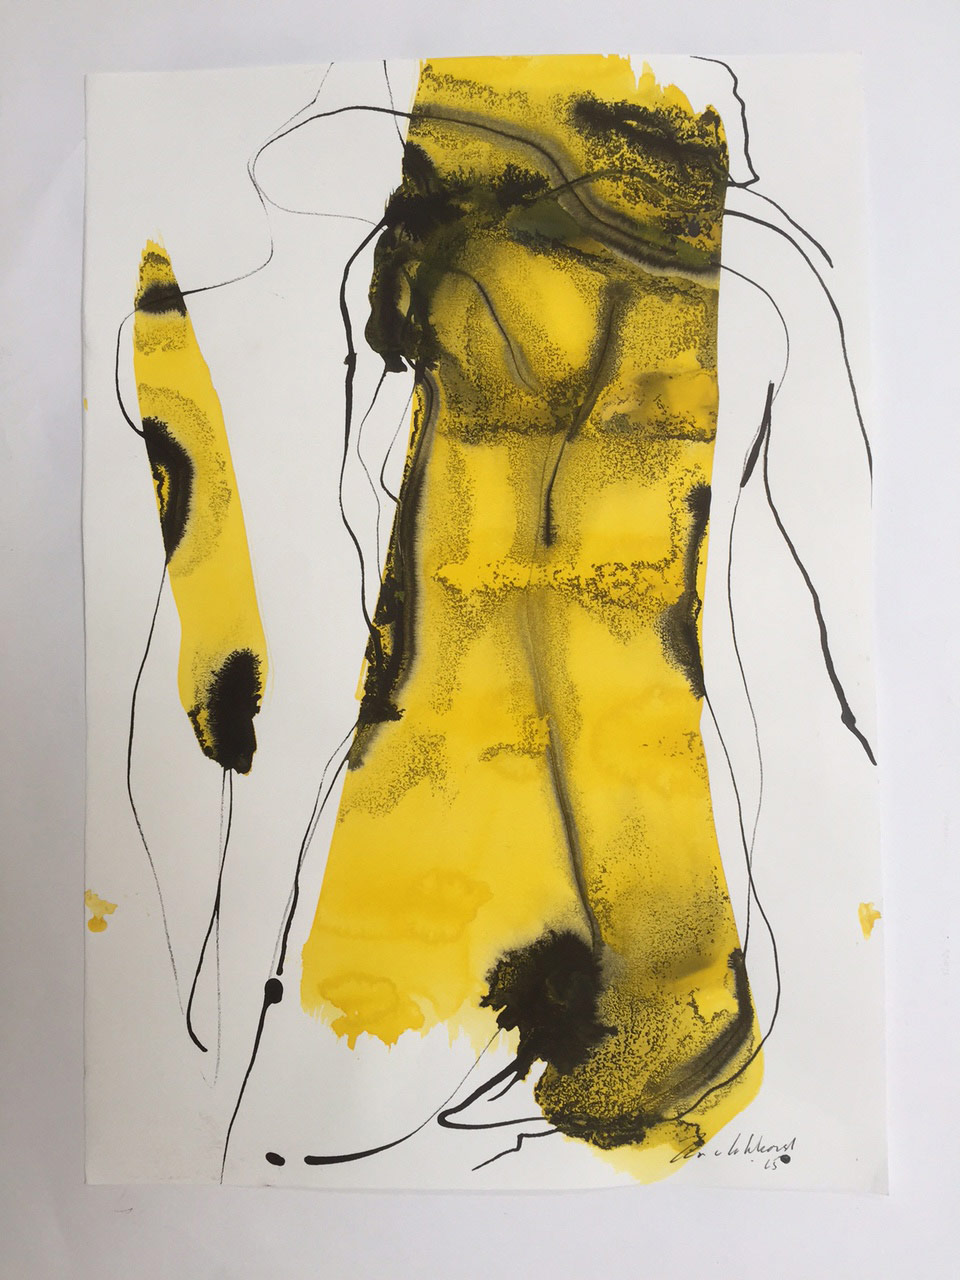 Jan van Lokhorst kunstenaar, papier